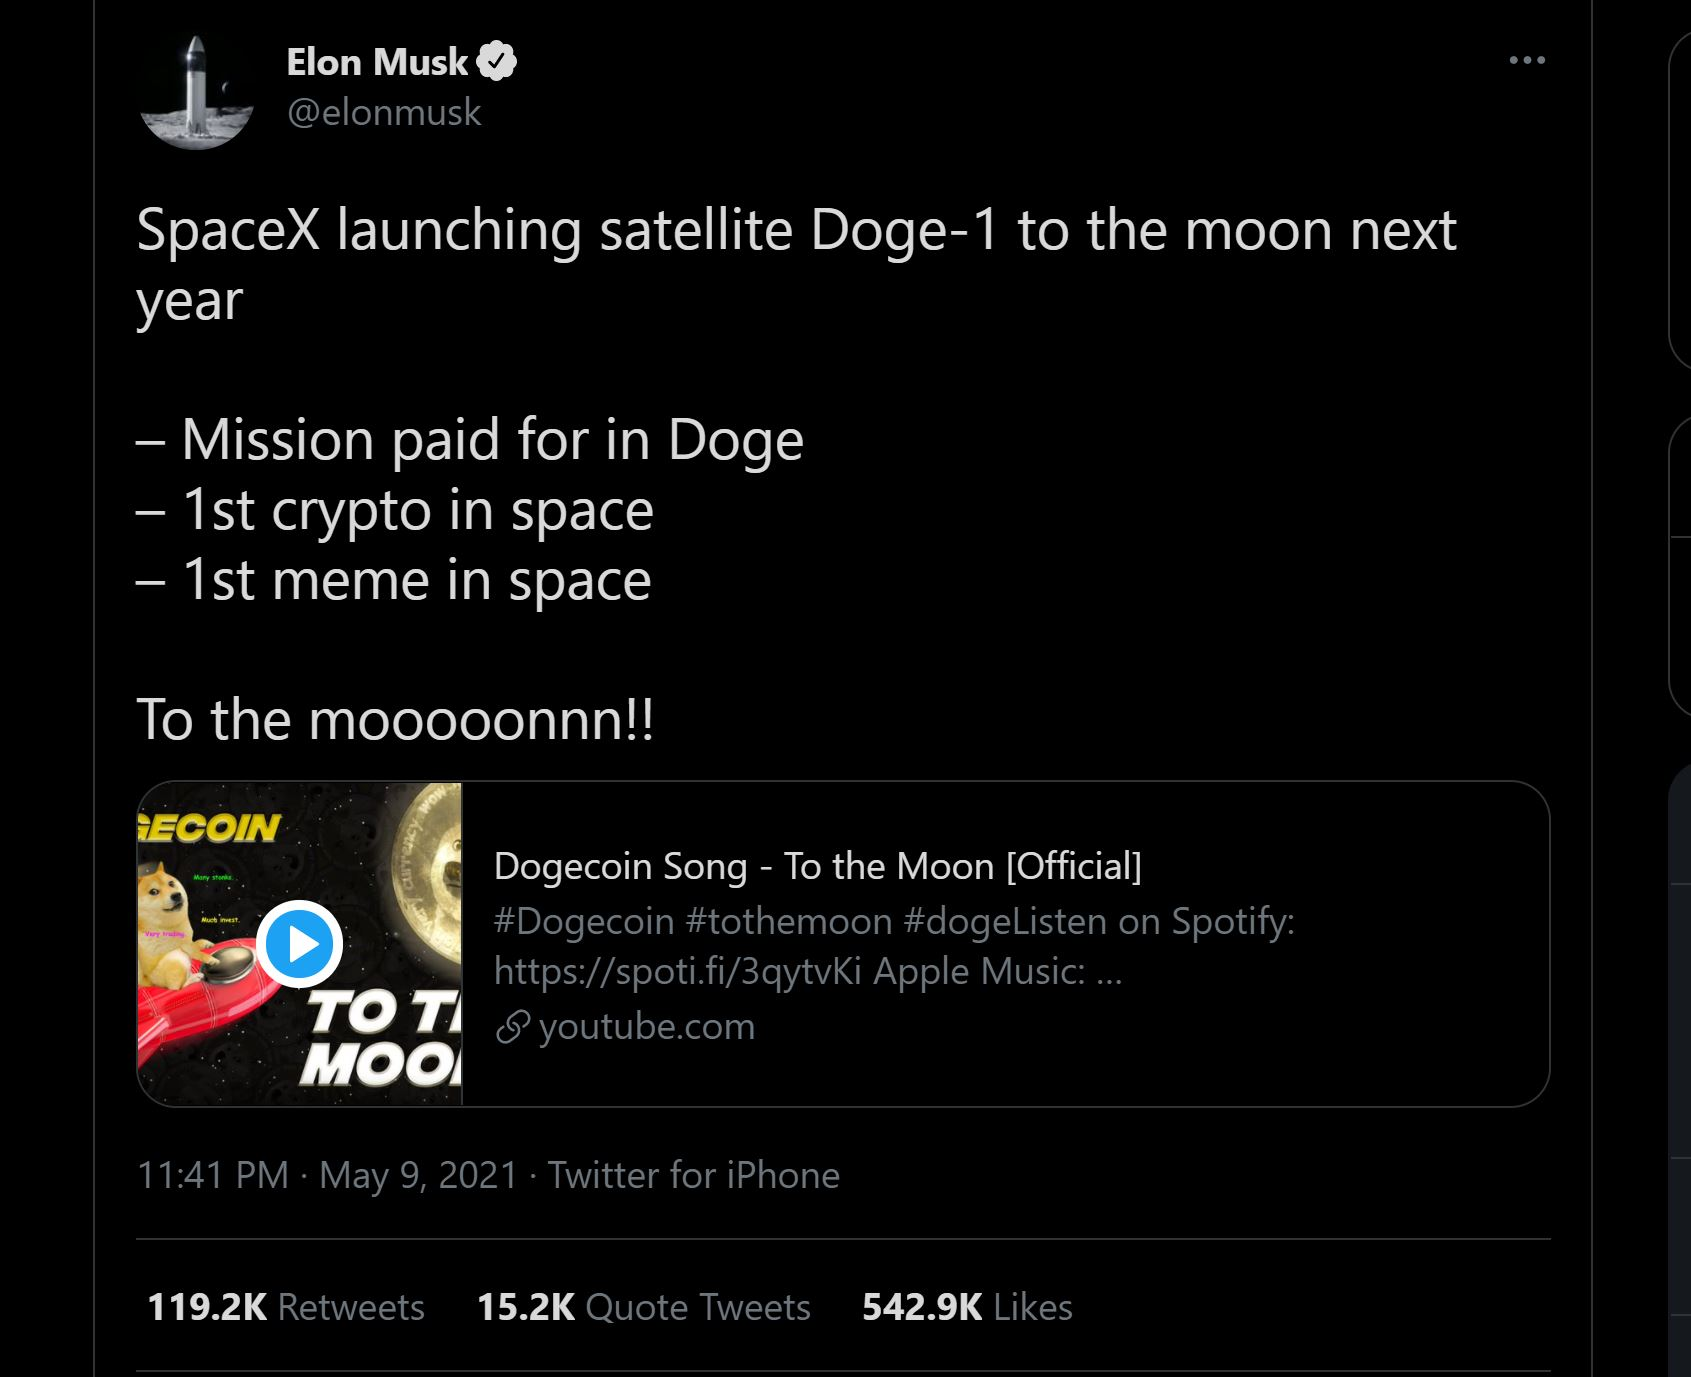 Shiba Inu Elon Musk tweet sur Dogecoin